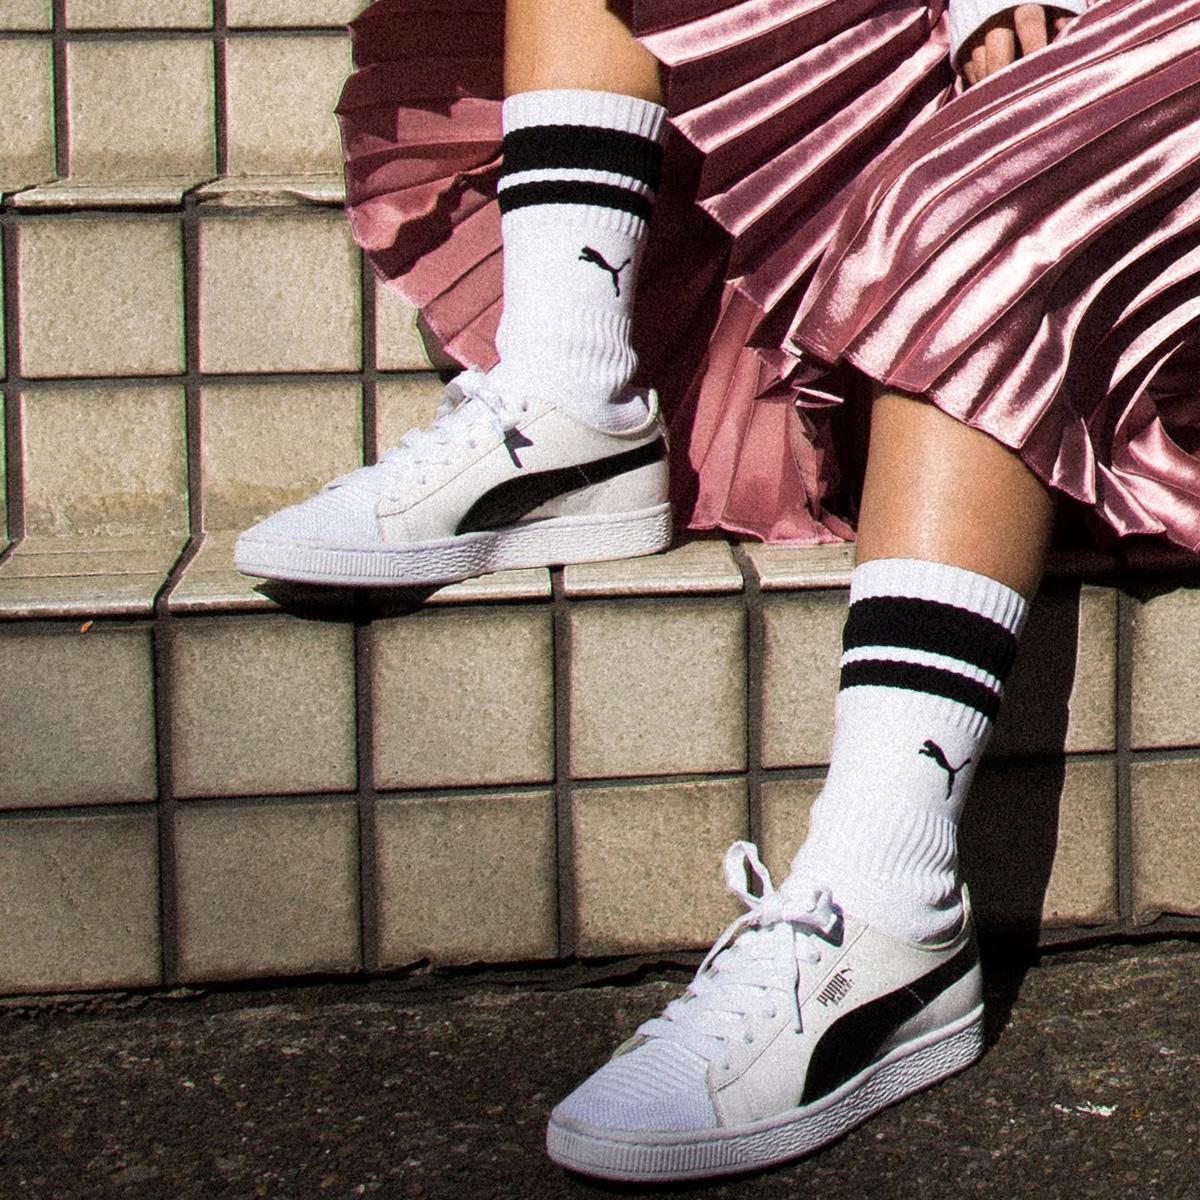 puma basket sock - 60% OFF